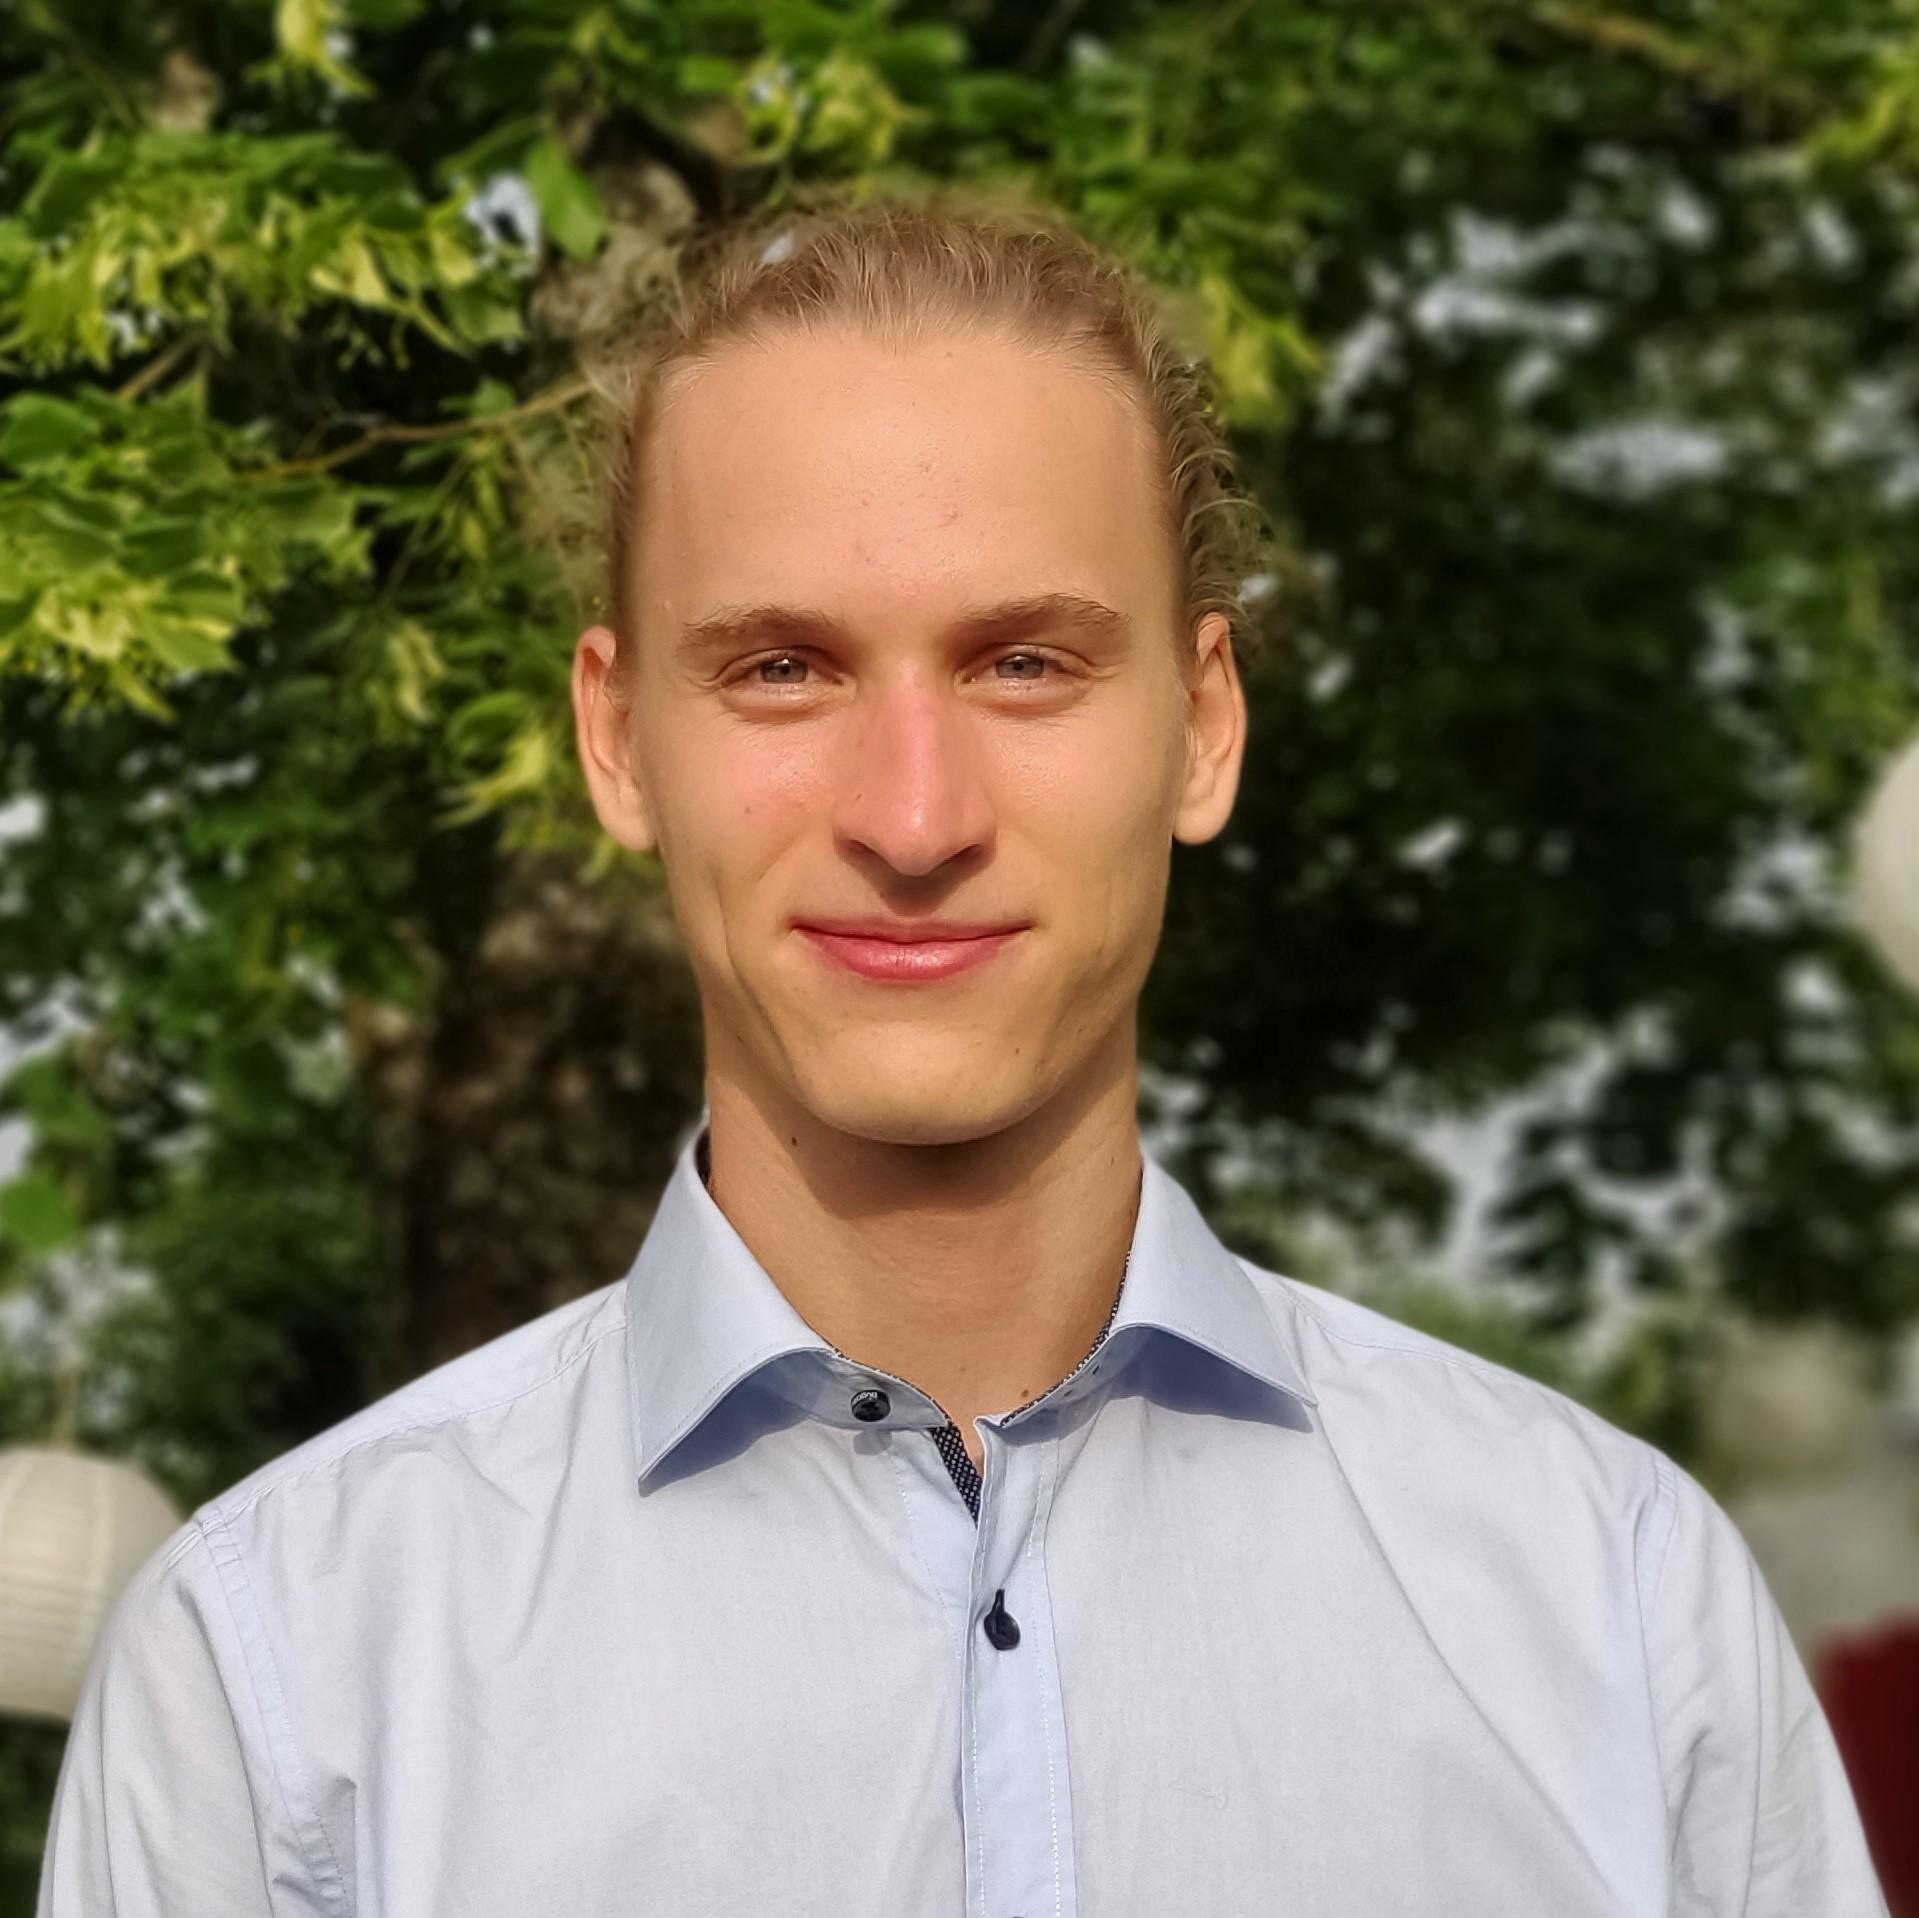 Michael Häseler